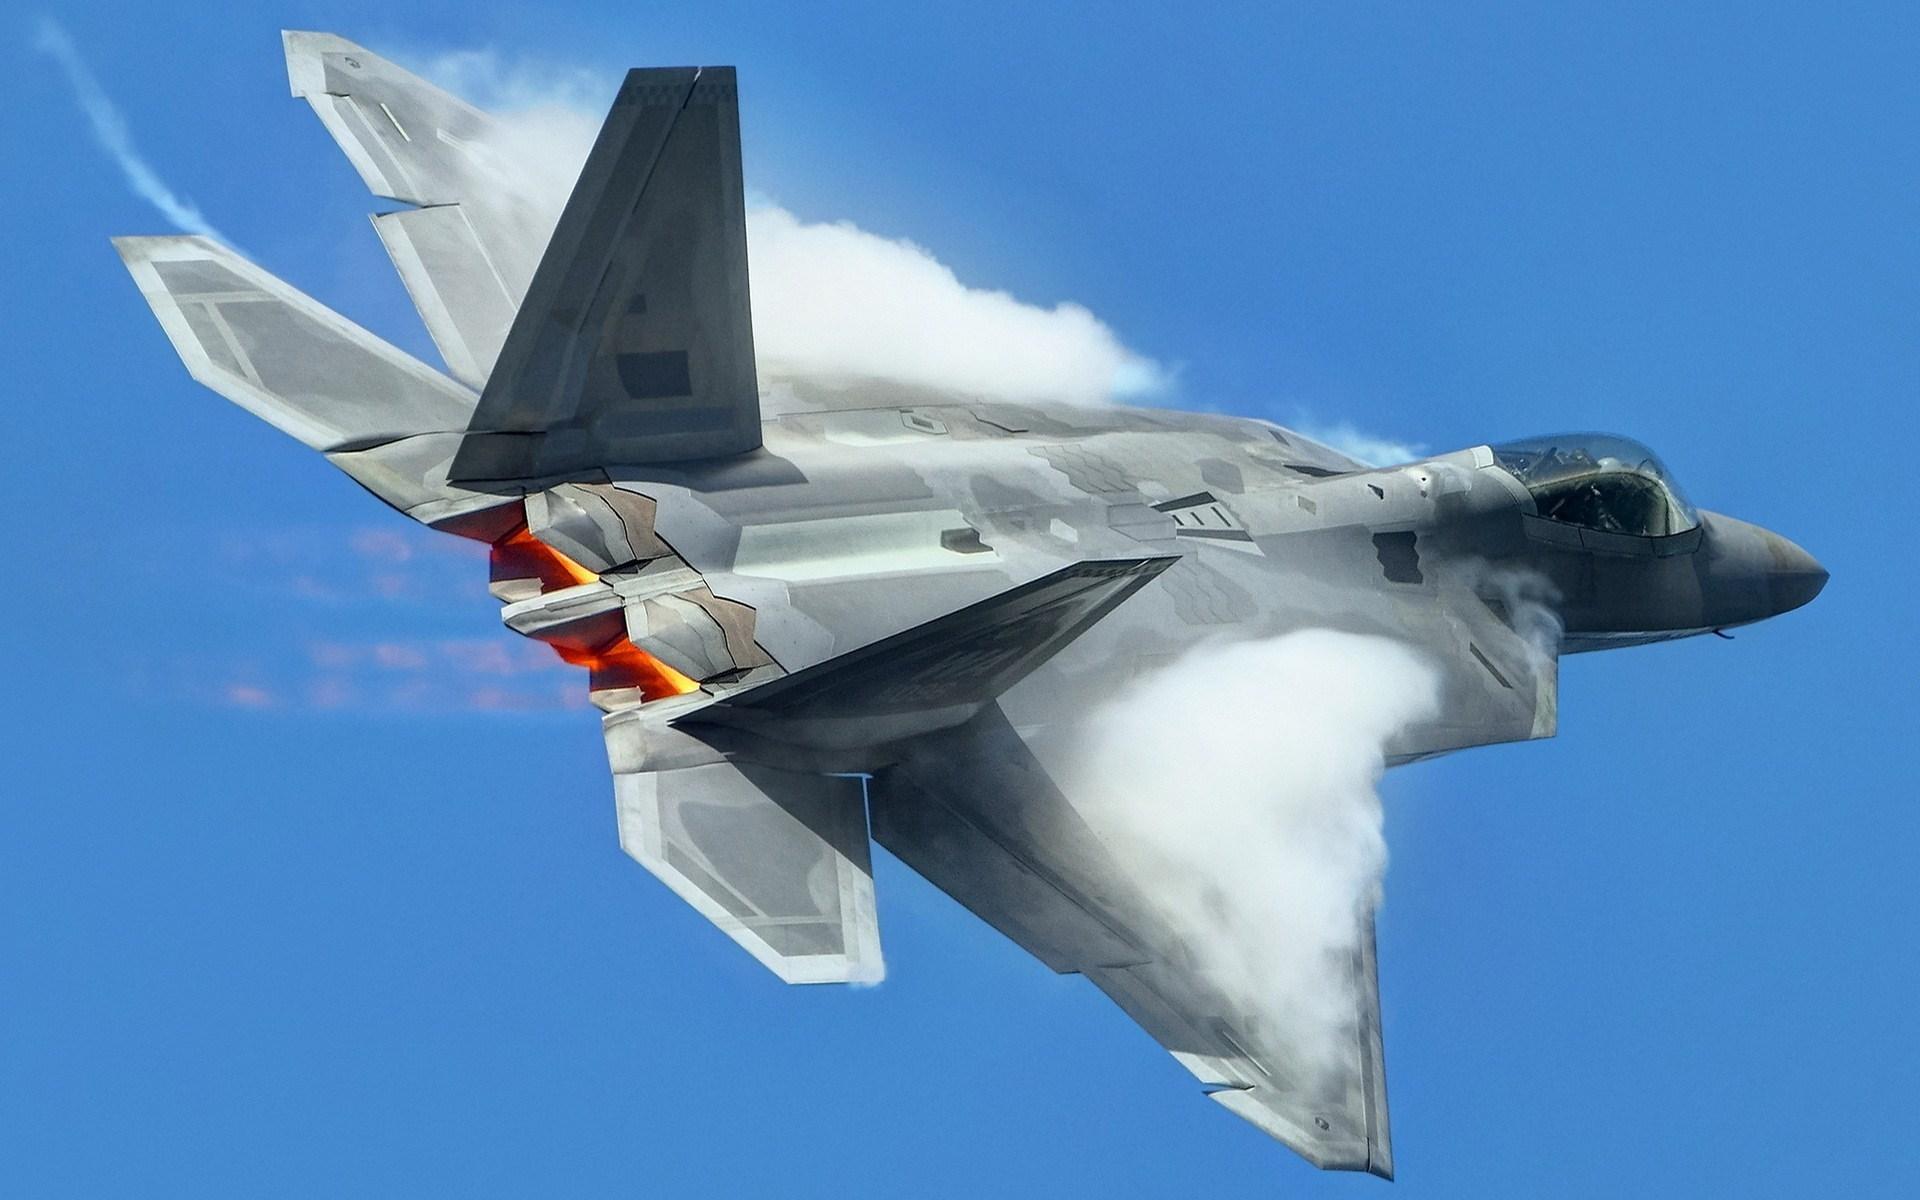 Fighter Aircraft Lockheed Martin F-22 Raptor